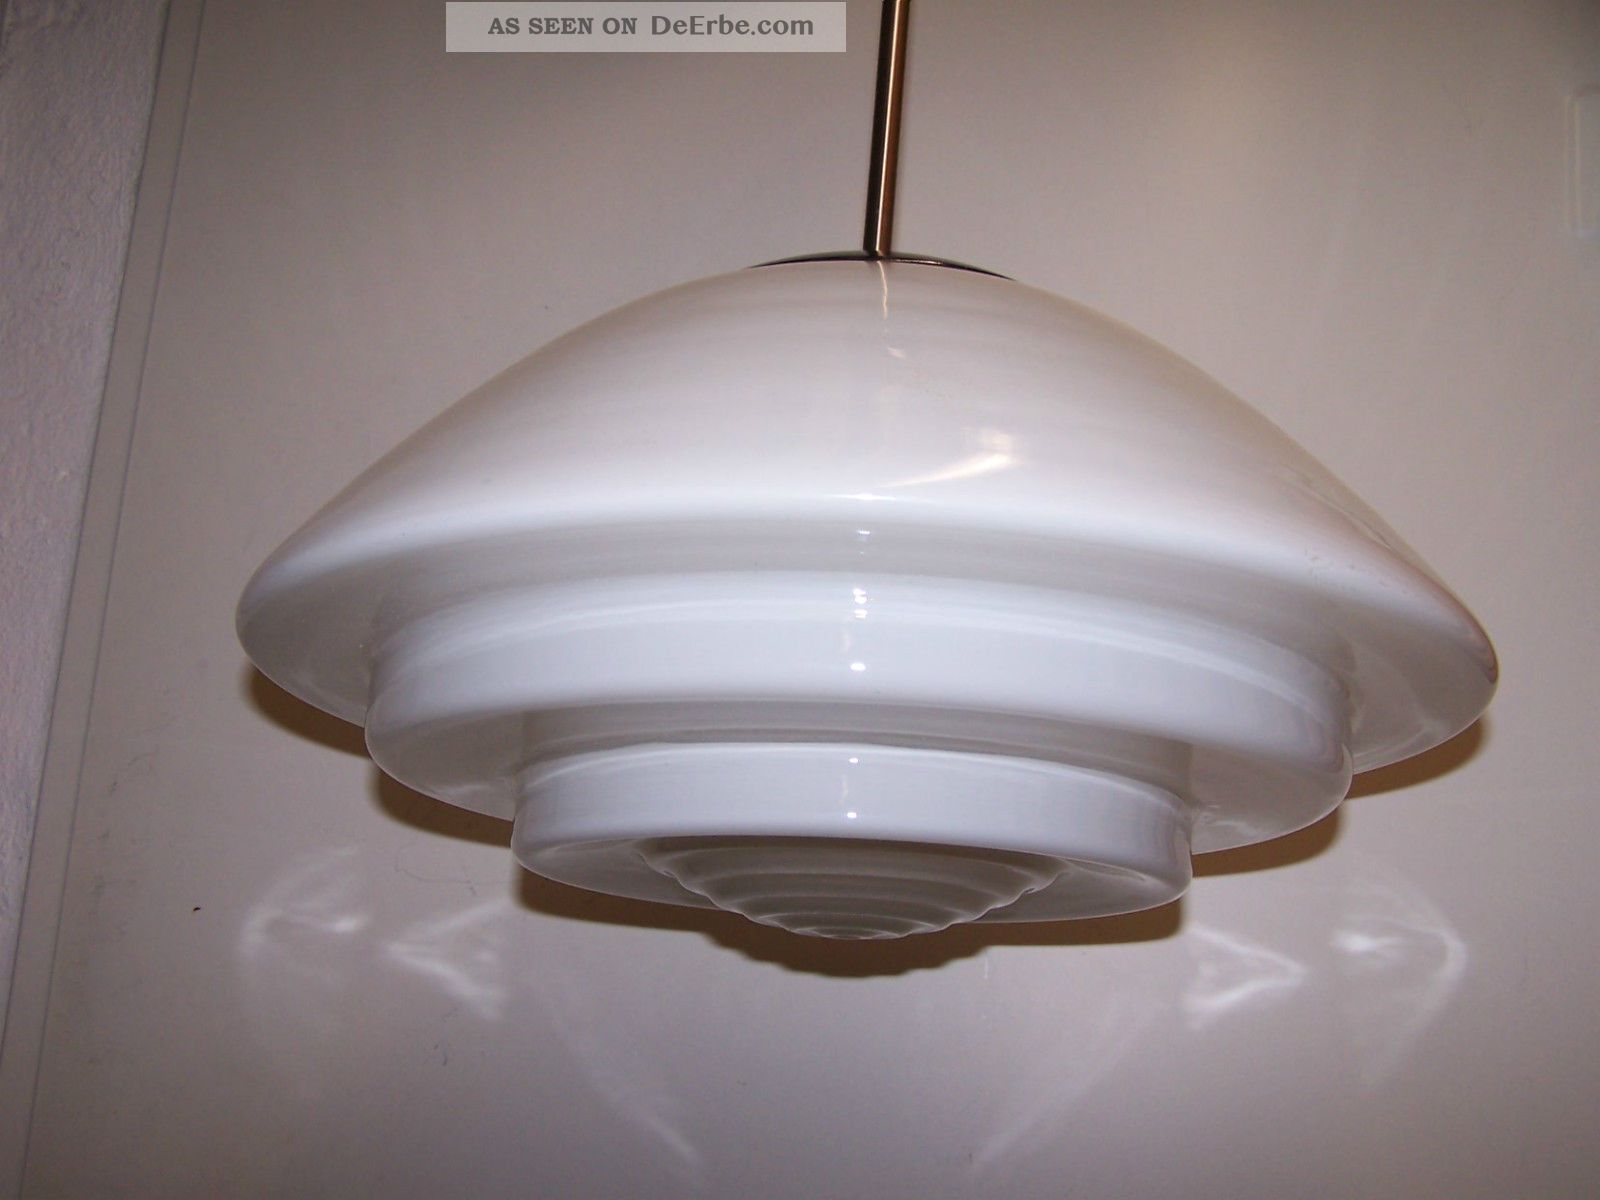 Grosse Bauhaus Lampe Deckenlampe Mithras Getreppt Opalglas Art Deco